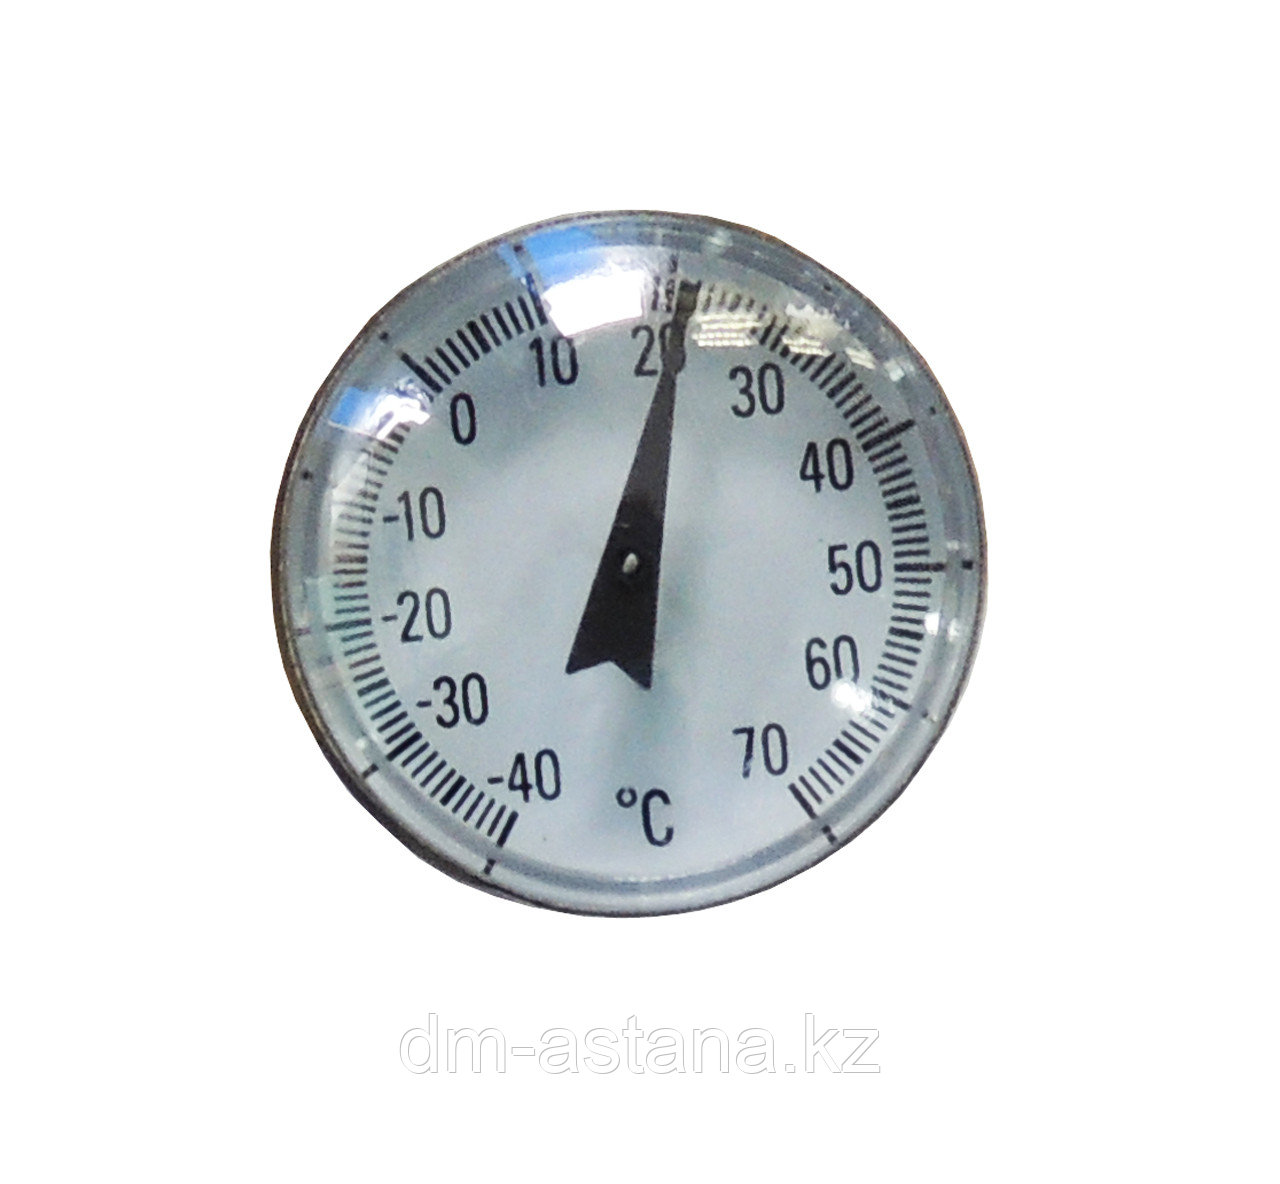 Оборудование для запр. конд термометр PT-1005 маном. (-40/ +70C) d=25мм Favor Cool